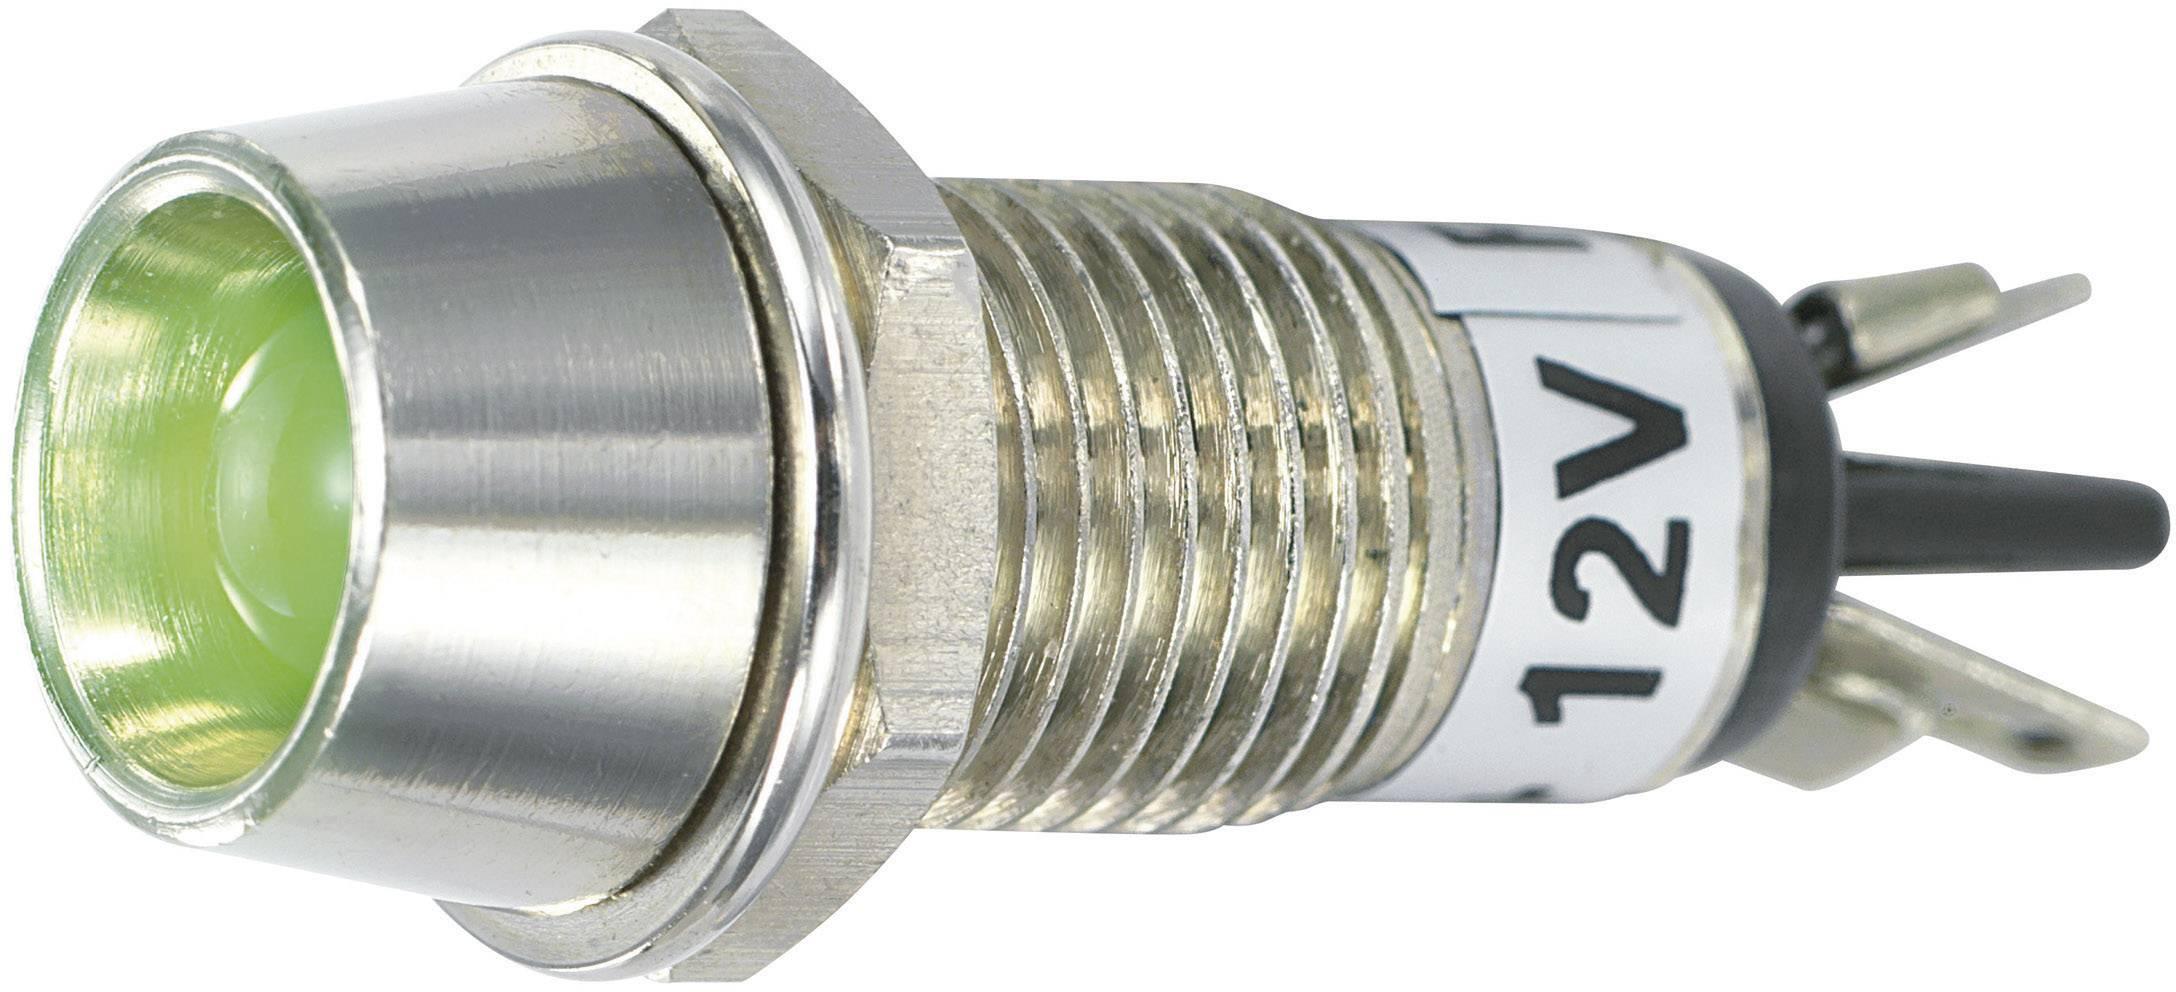 IndikačnéLED SCI R9-115L 12 V GREEN, 12 V/DC, zelená